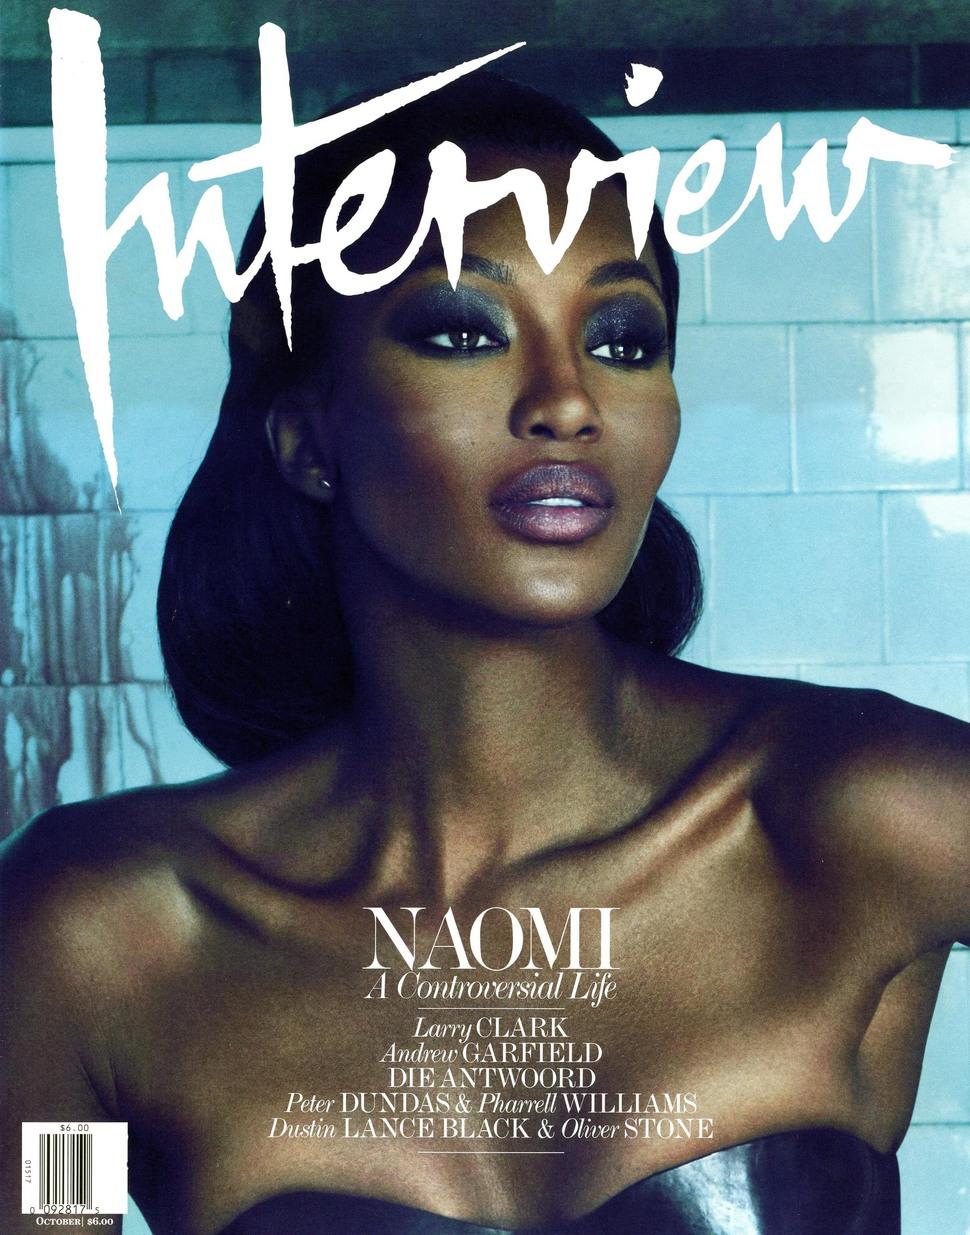 Наоми Кэмпбелл станет редактором журнала Interview